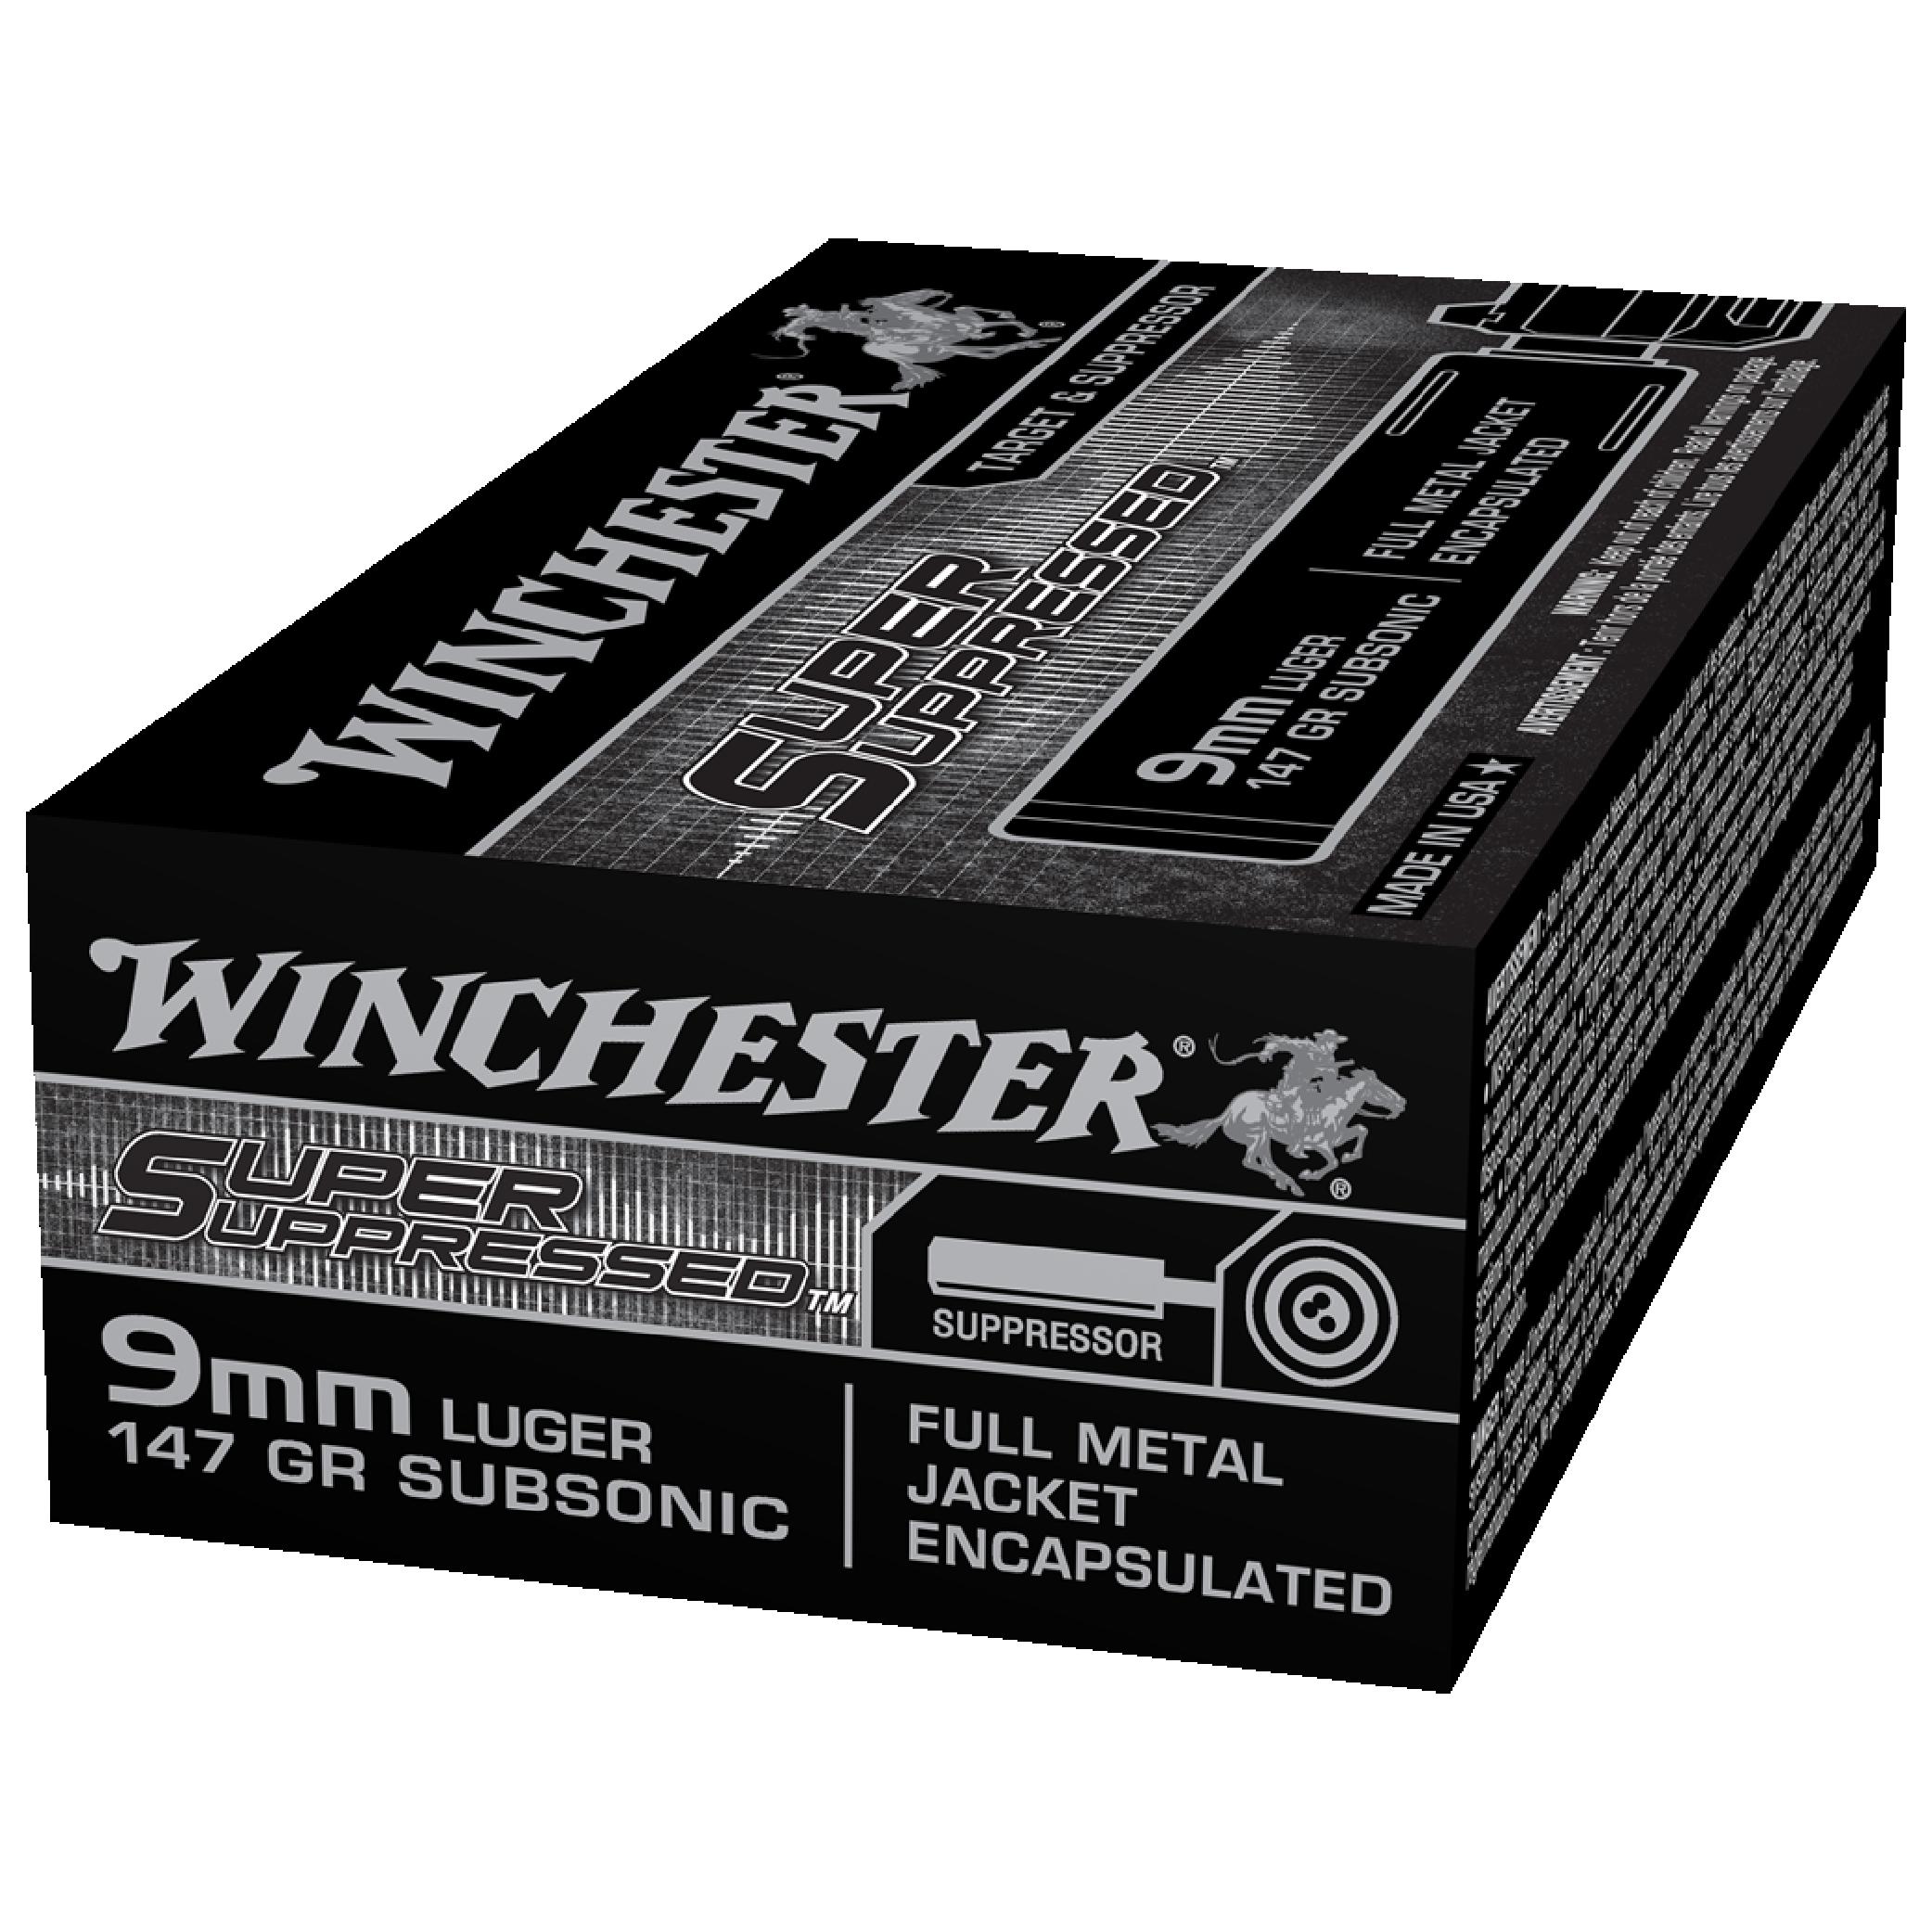 Winchester Super Suppressed 9MM 147gr FMJ